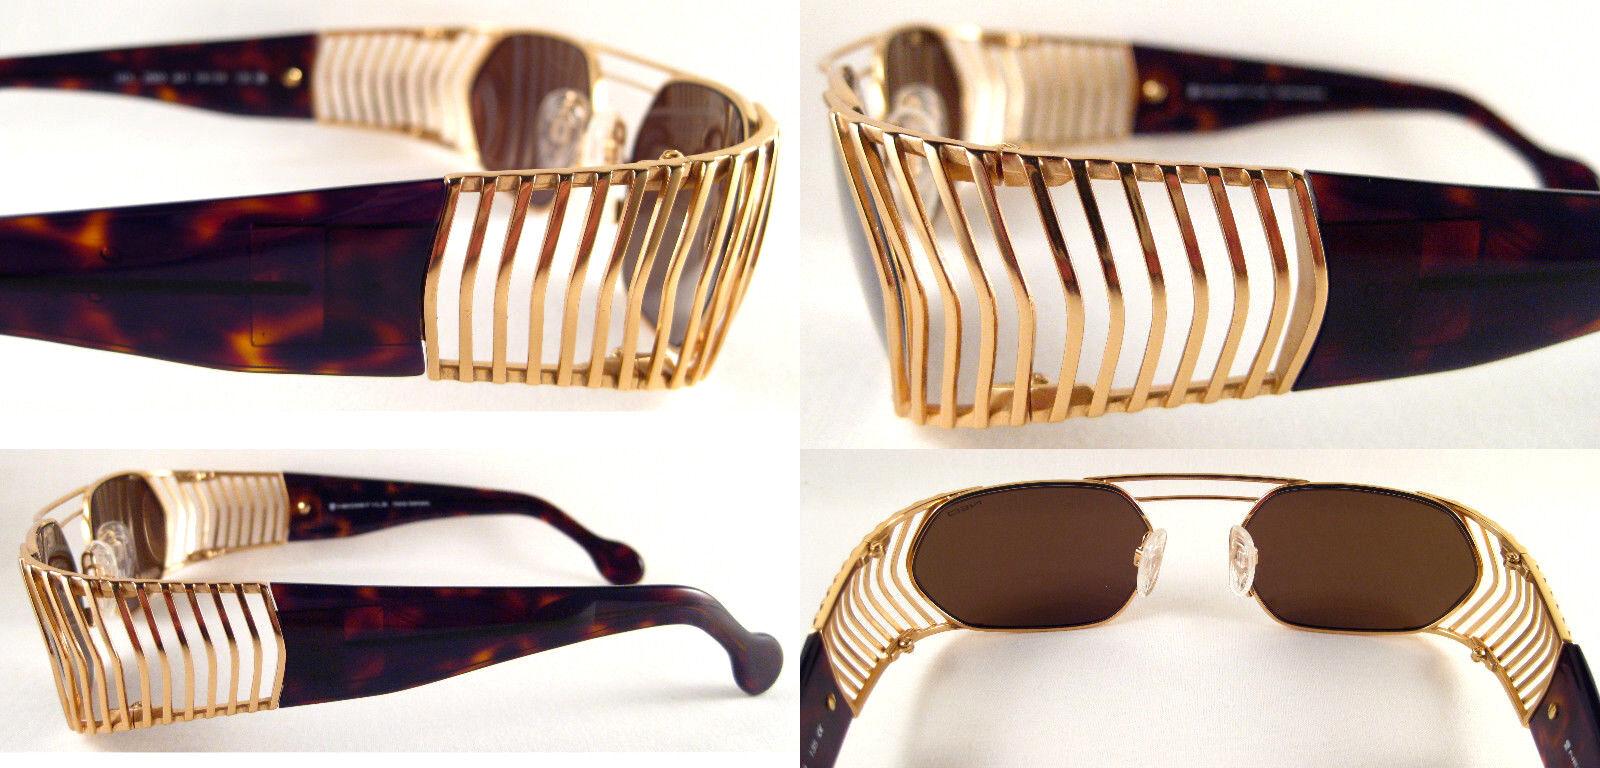 RARE & & & VINTAGE HOLLYWOOD STYLE UNISEX SUNGLASSES METAL   Gold   braun,   | Hohe Qualität und günstig  1858be